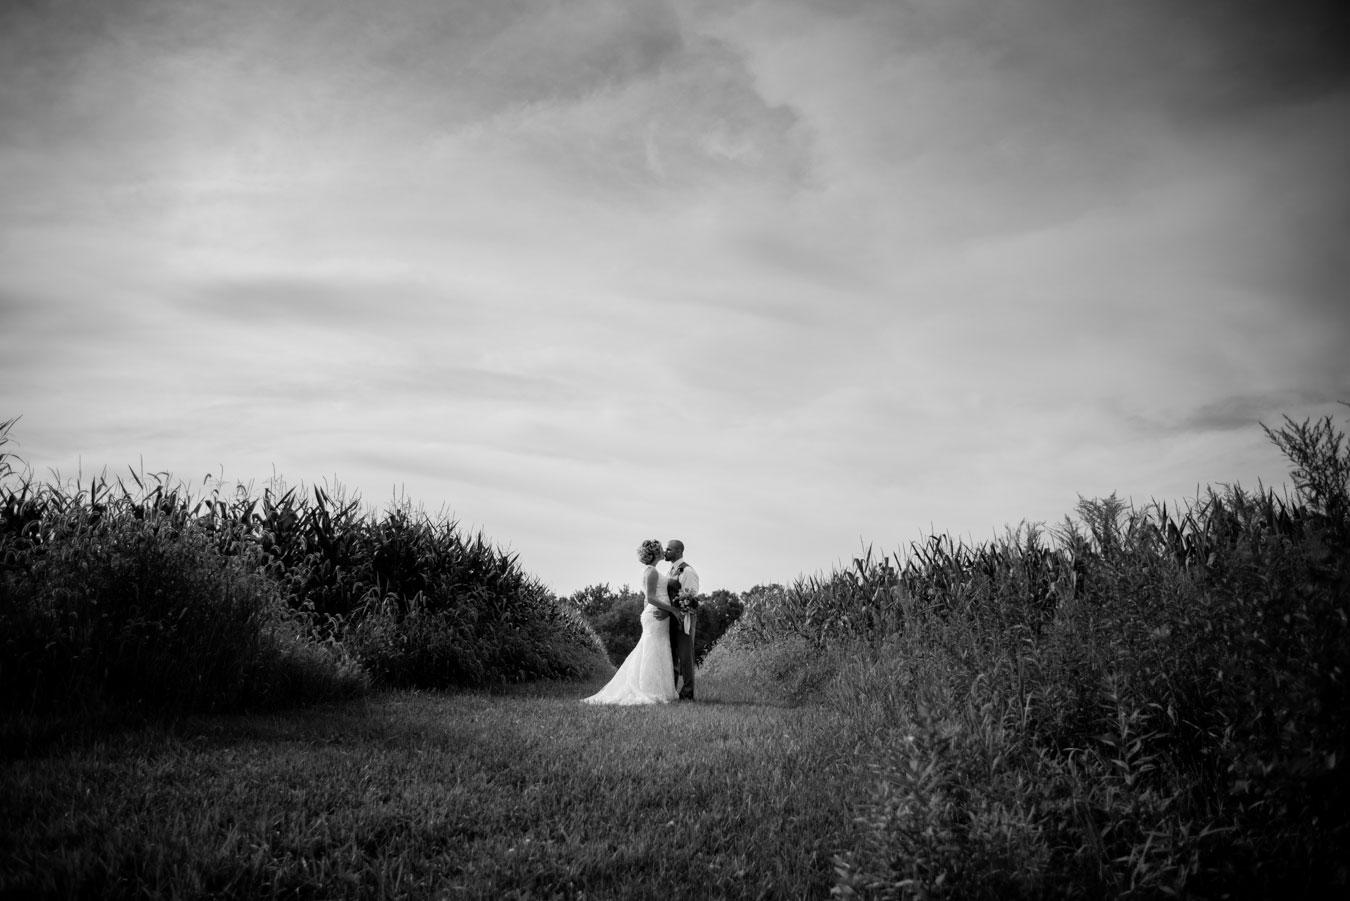 Williamsport-wedding-venues.jpg